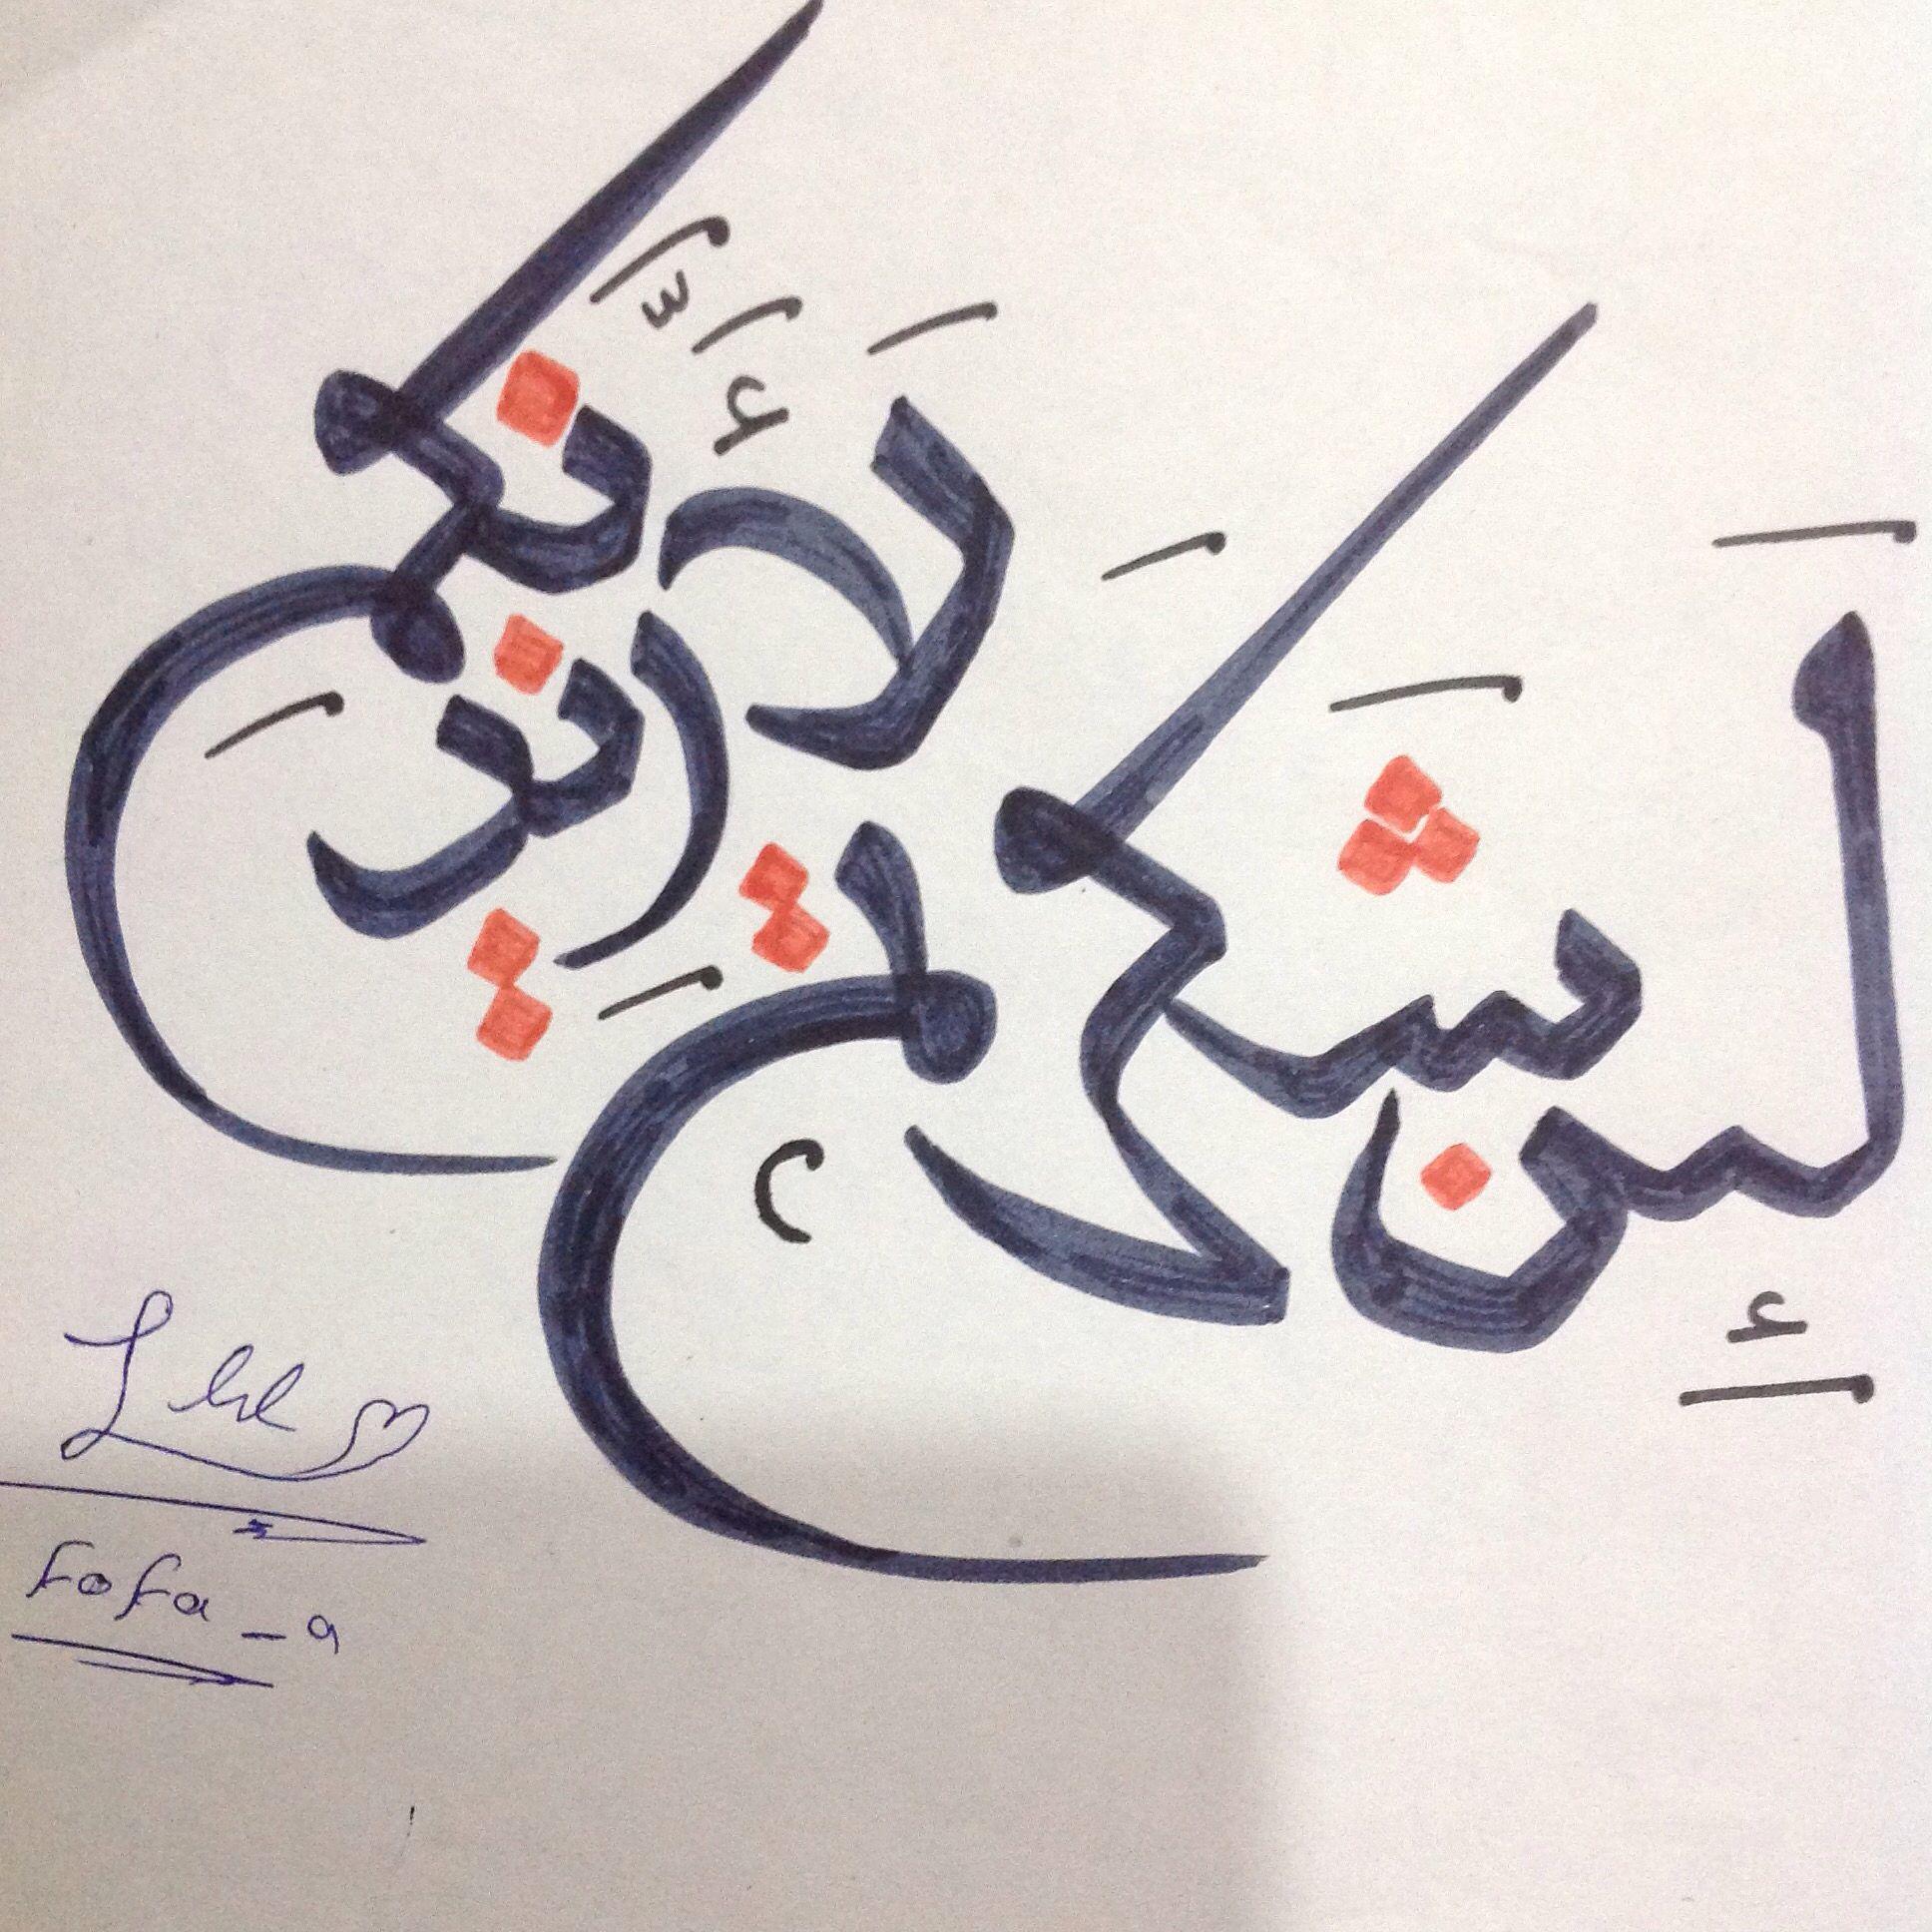 لئن شكرتم لأزيدنكم Arabic calligraphy, Calligraphy, Art